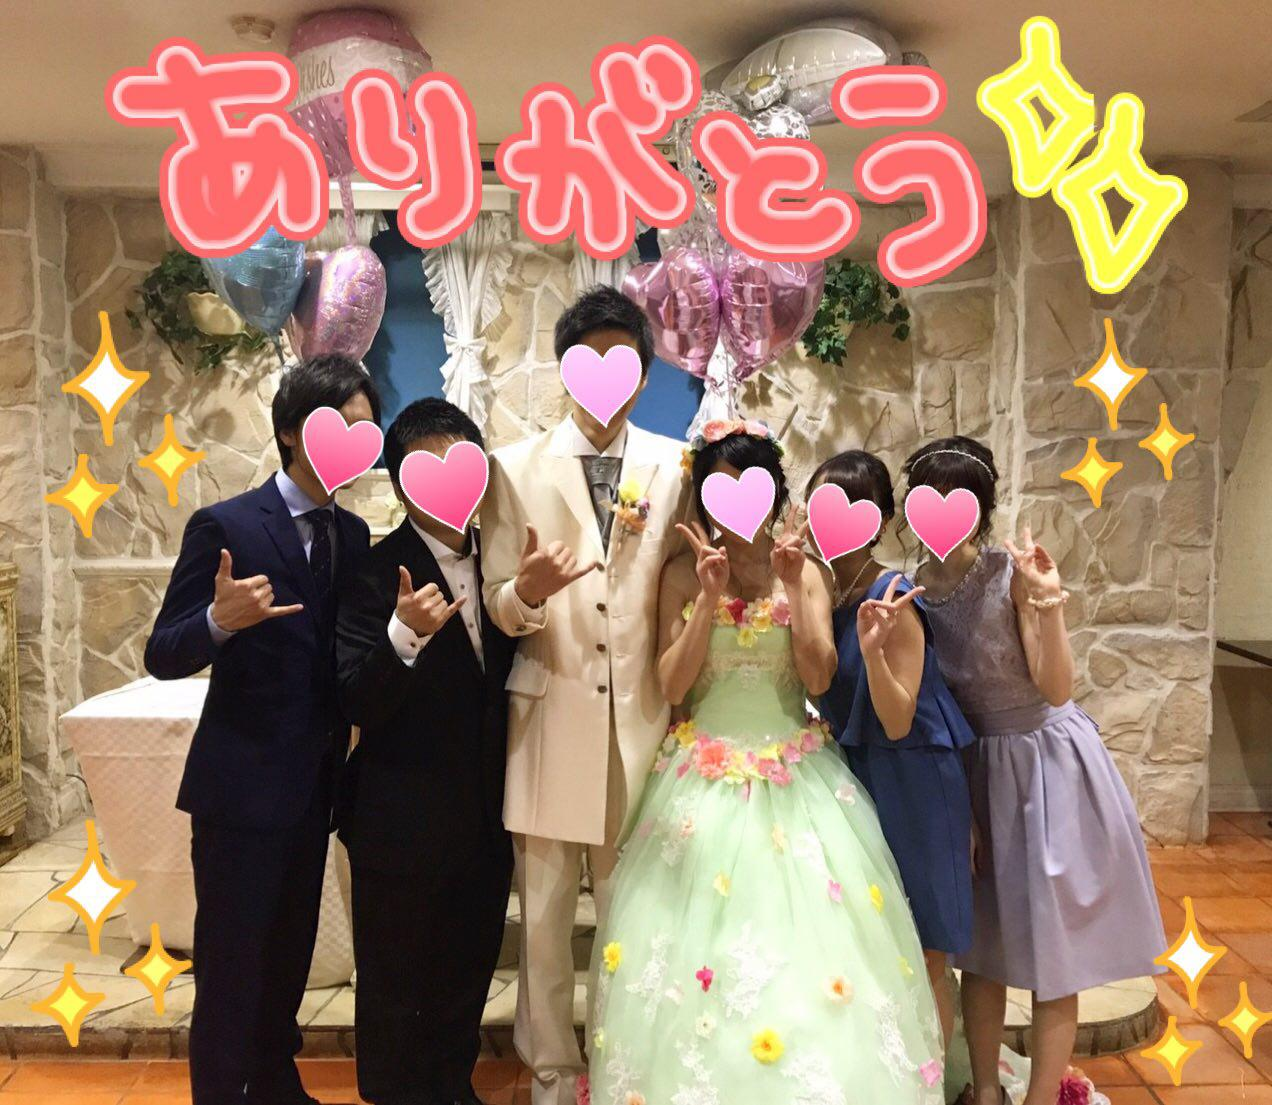 photo_2017-05-03_01-07-19.jpg